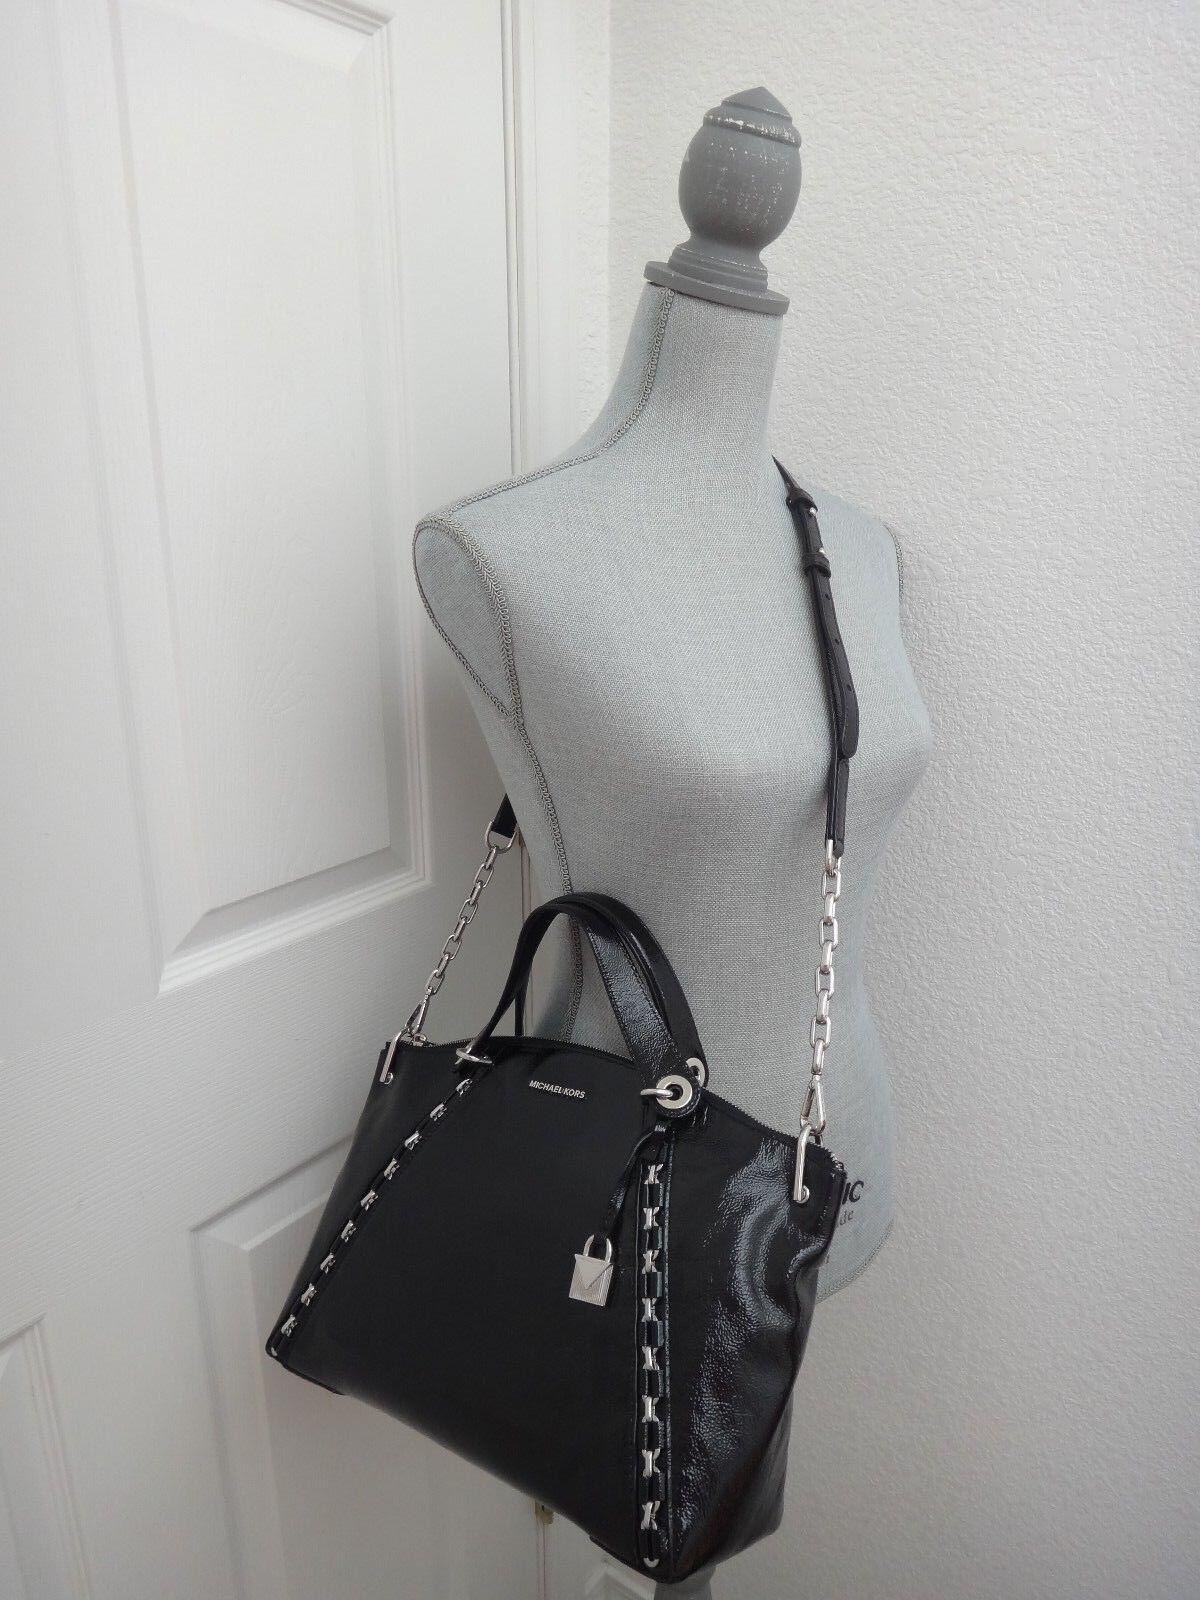 Michael Kors Women S Sadie Mk Black Patent Leather Lg Tz Satchel Bag 30f7saes3a 191262437595 Ebay